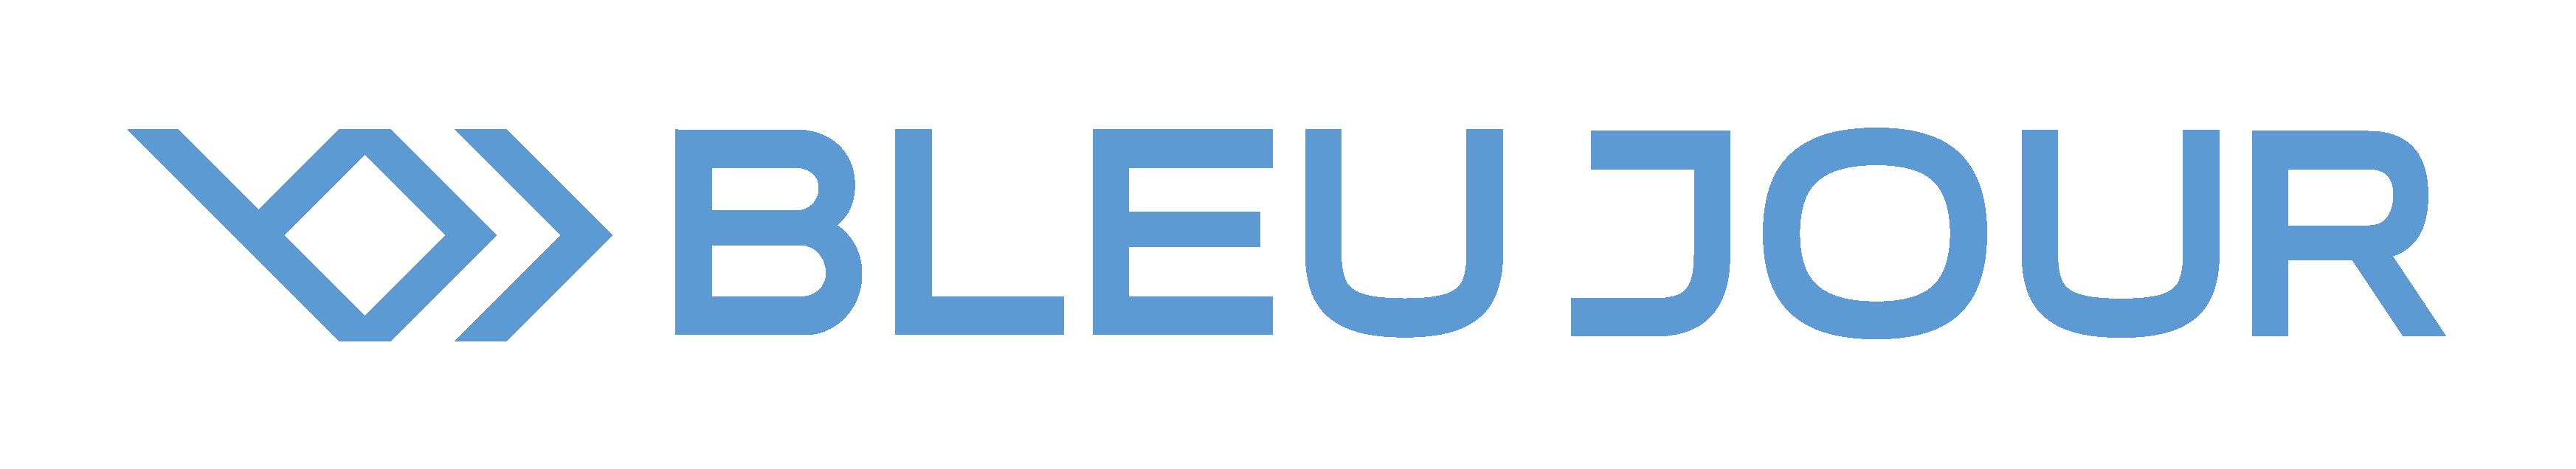 https://www.bleujour.com/wp-content/uploads/2020/12/logonaming-bleujour-line.png